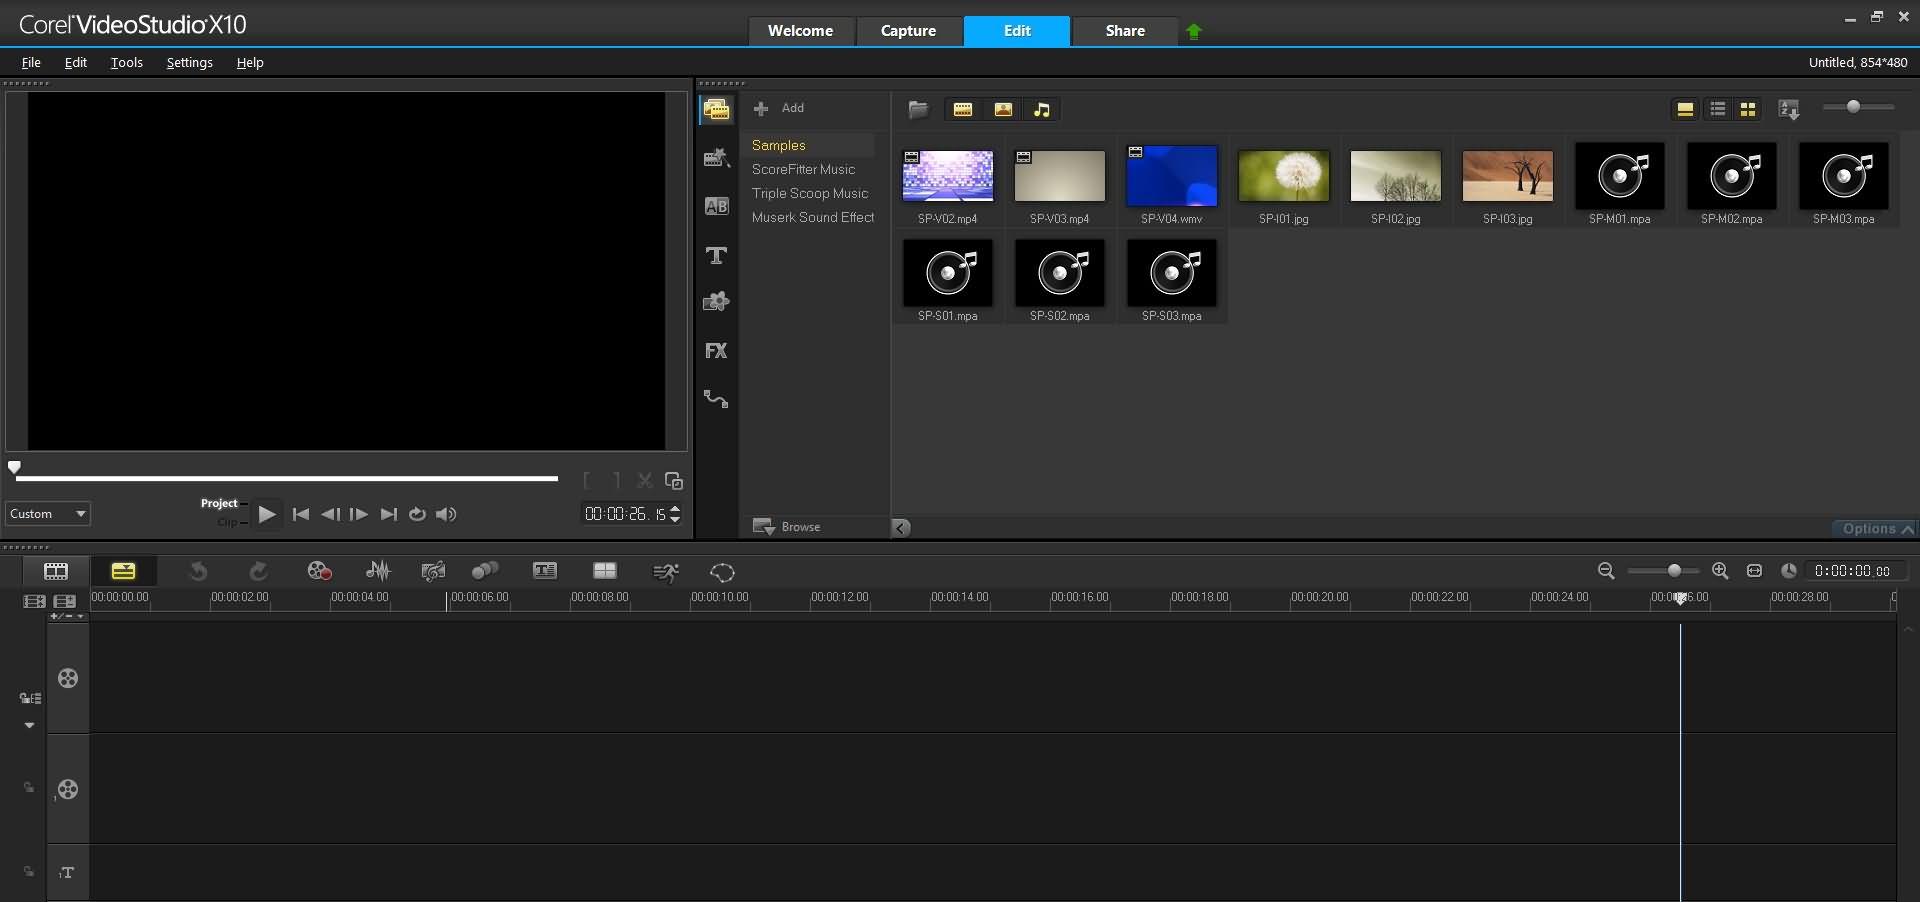 Corel Videostudio interface